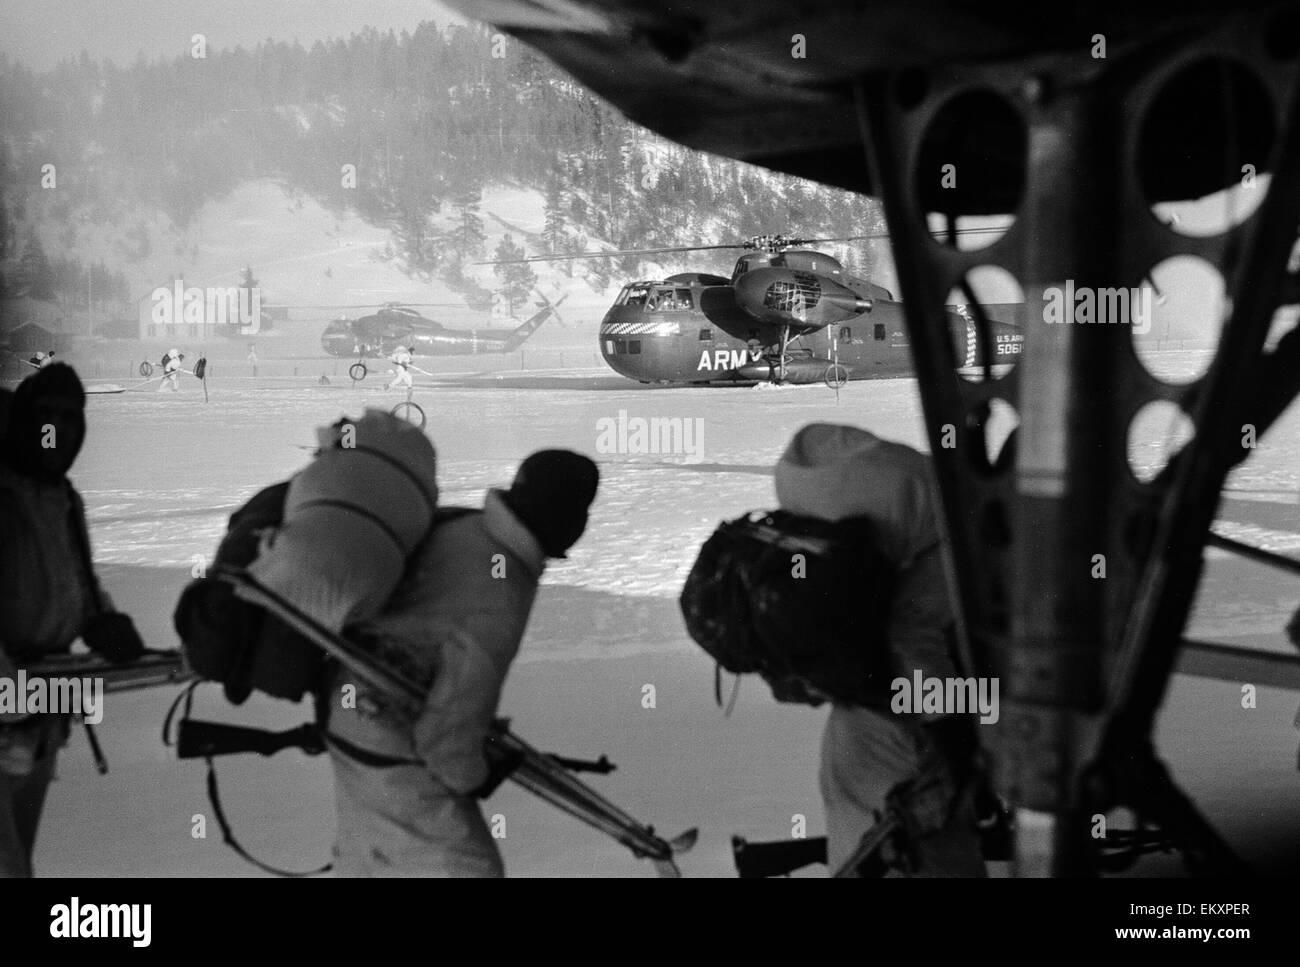 Ejercicios N.A.T.O en Noruega. Febrero de 1966 Imagen De Stock